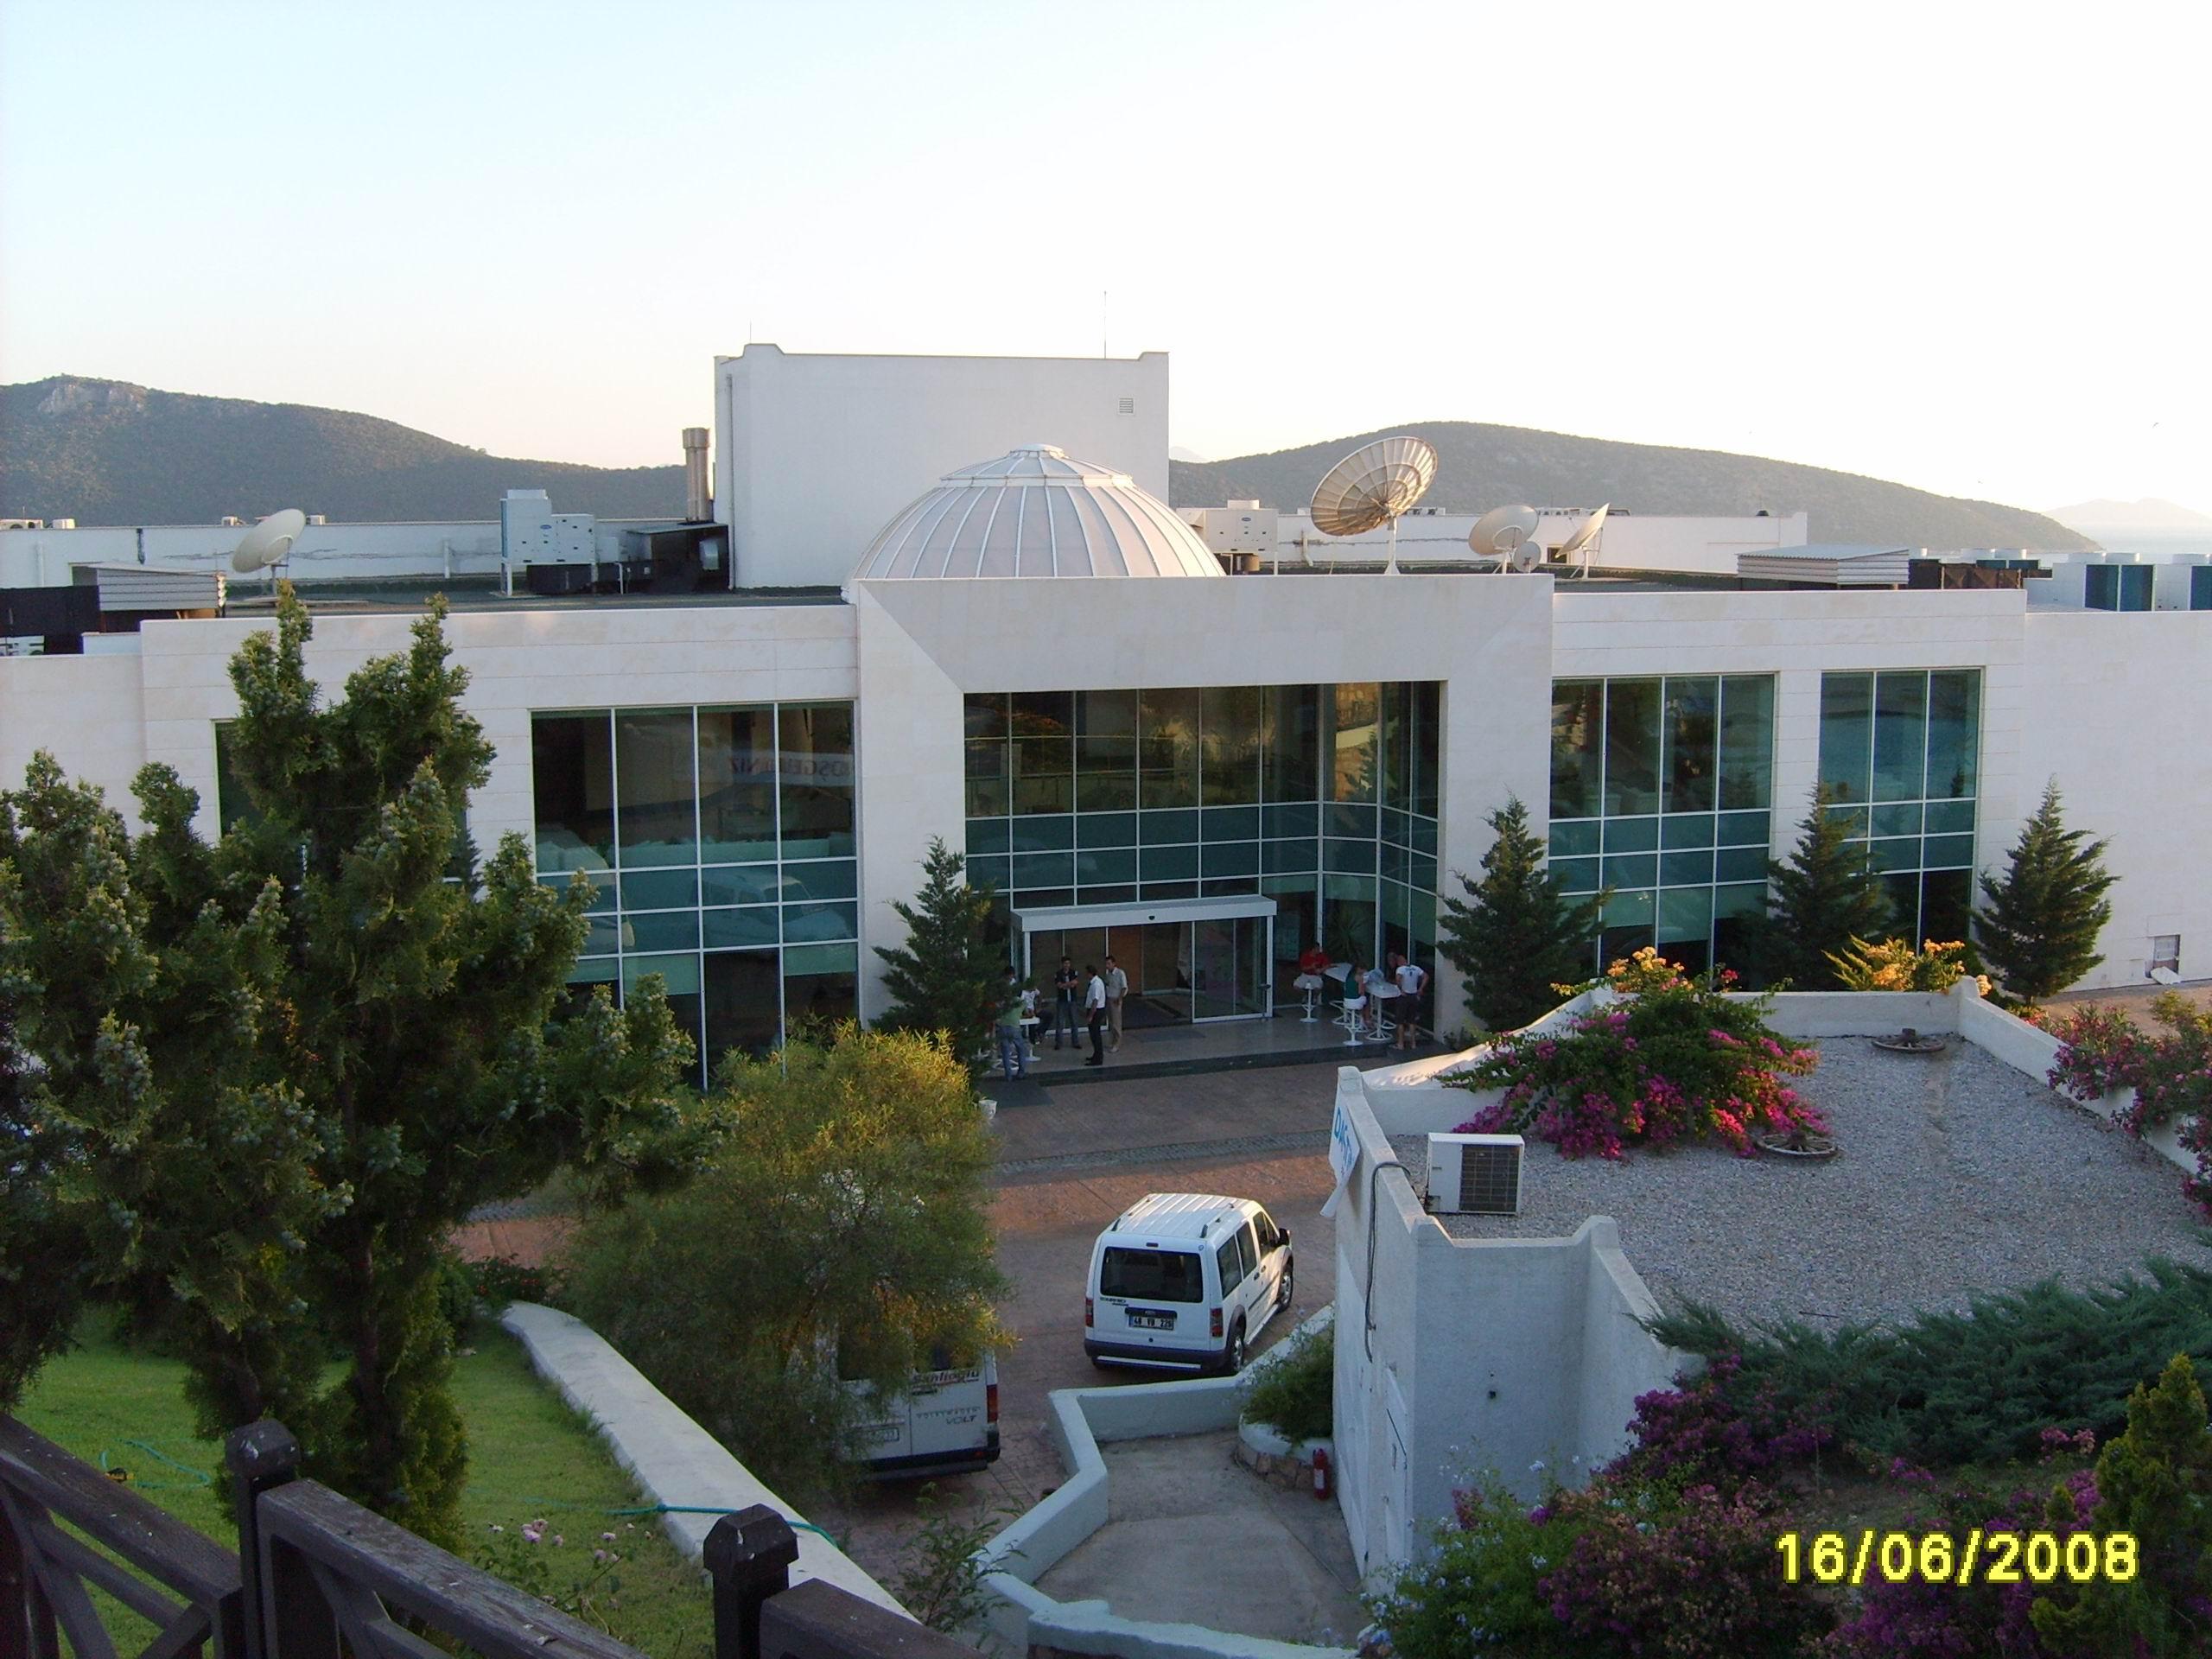 Majesty Club Hotel Belizia 5* - центральный вход